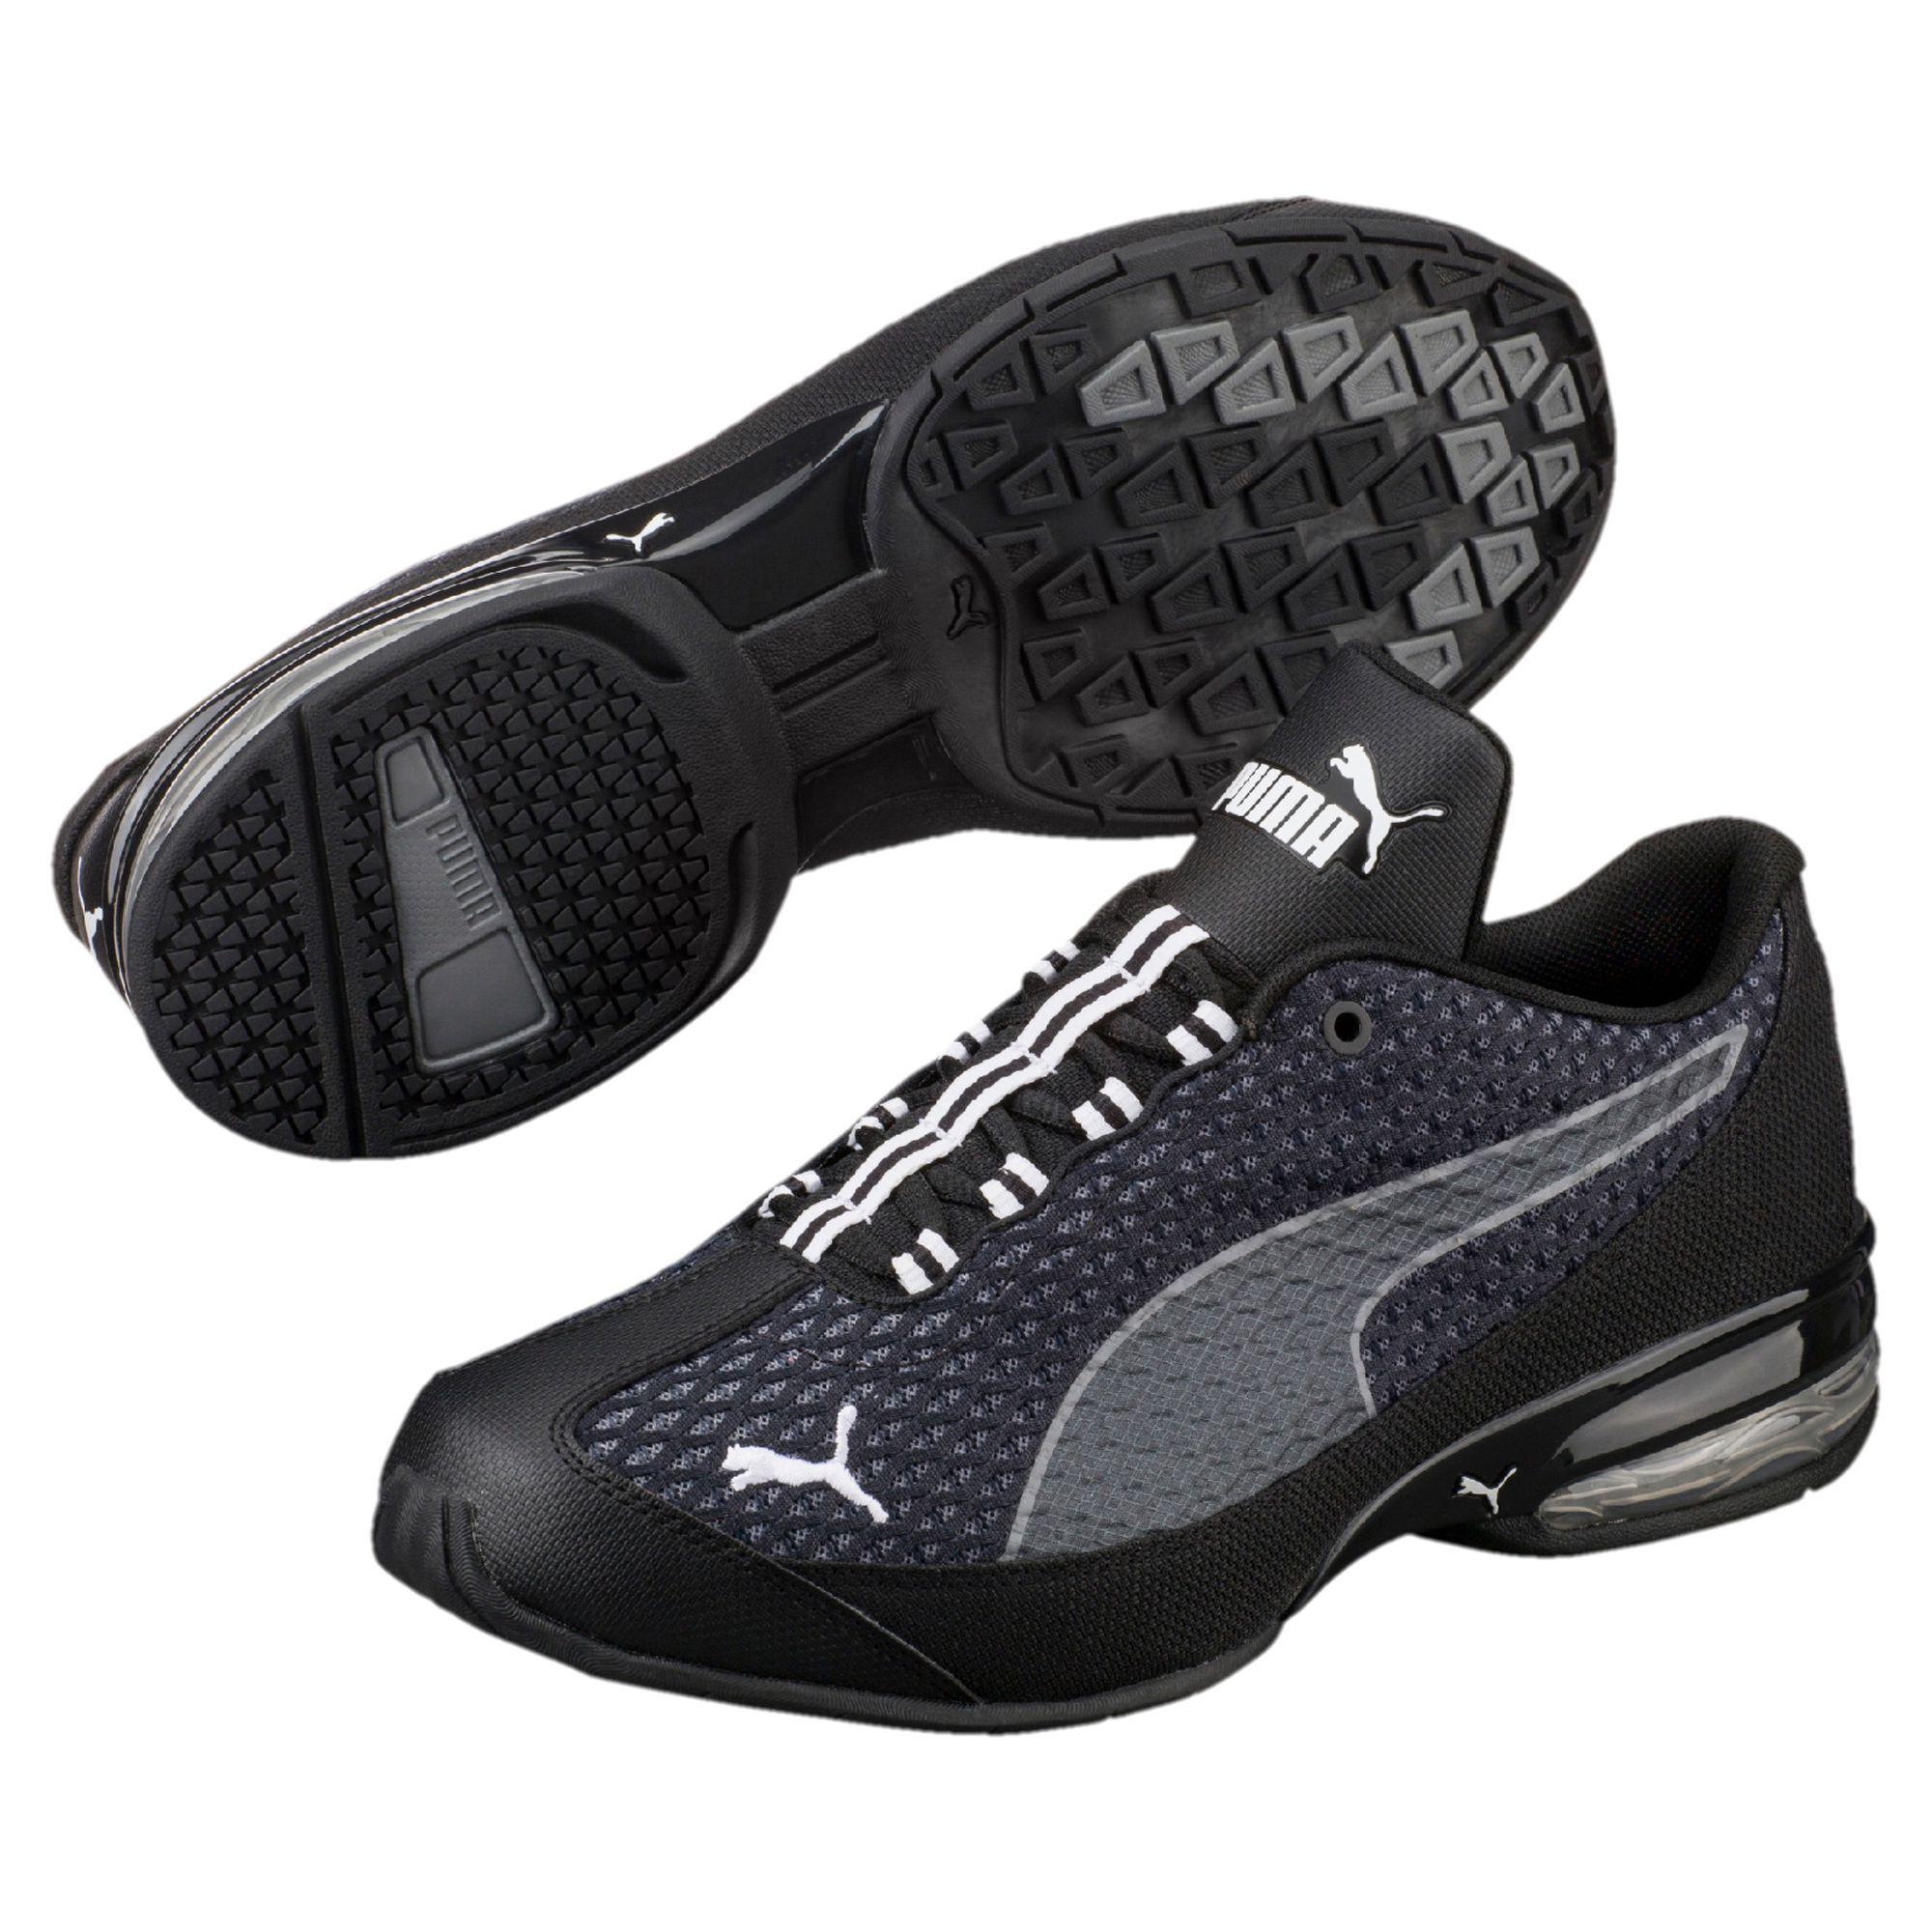 054822544ca9 Lyst - PUMA Reverb Cross Men s Running Shoes in Black for Men